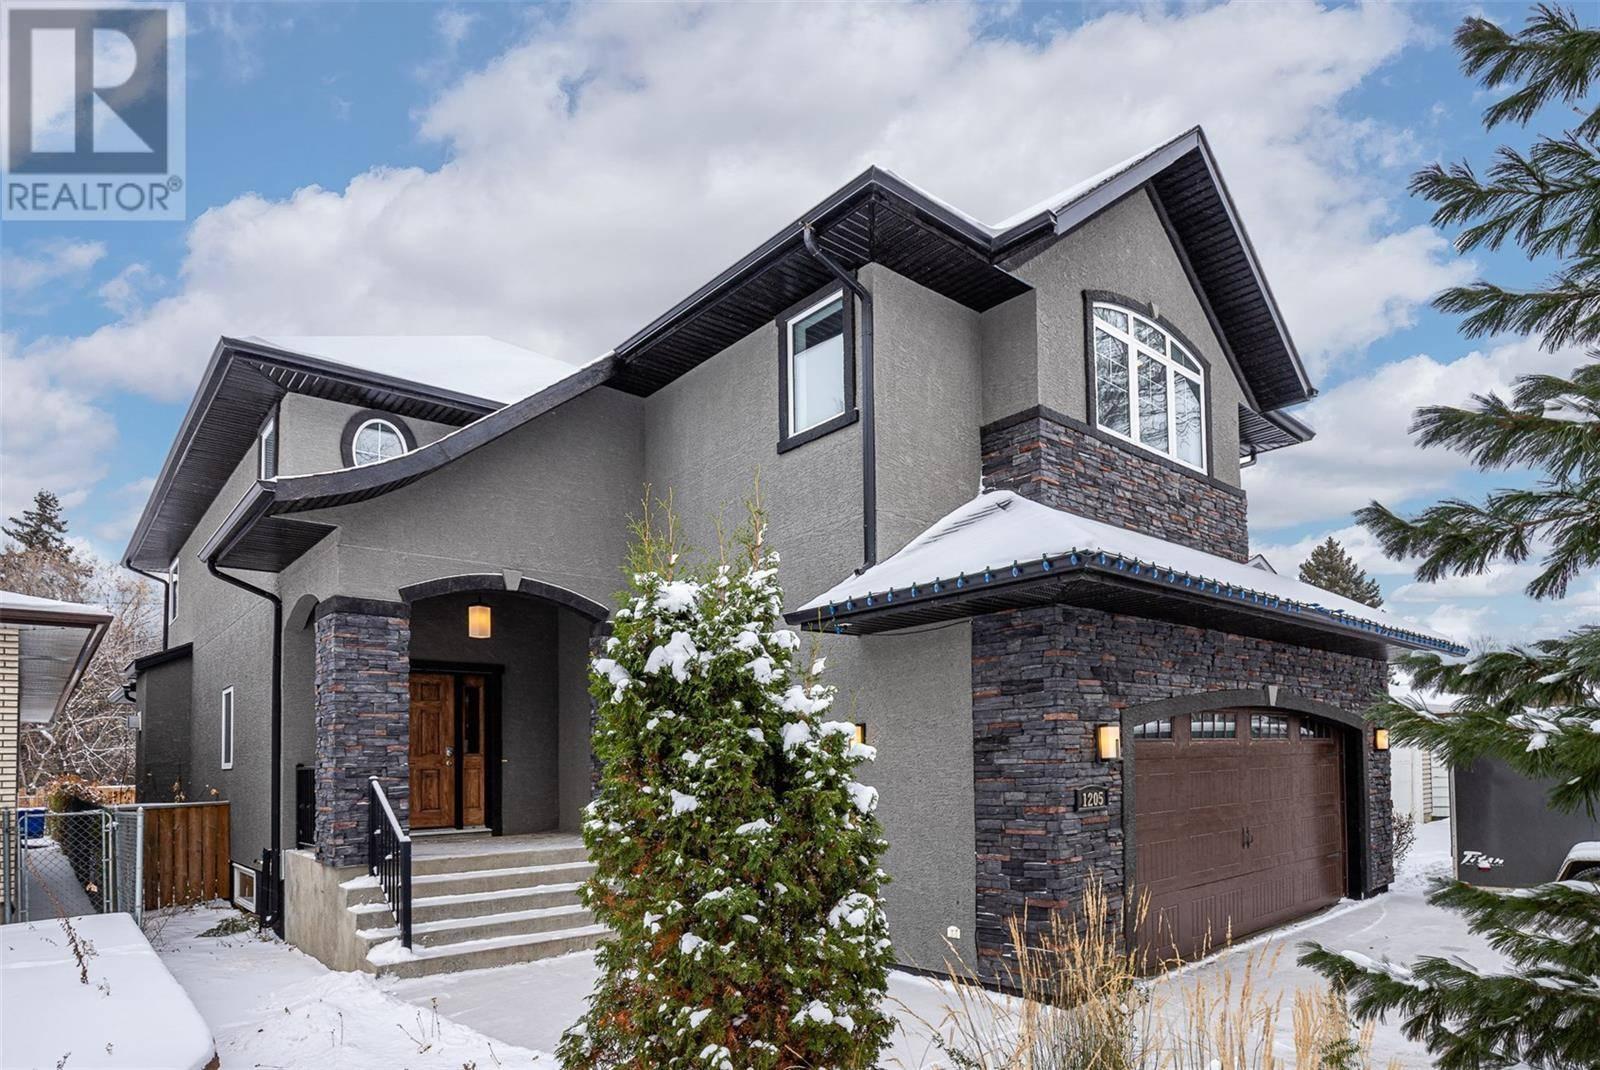 House for sale at 1205 15th St E Saskatoon Saskatchewan - MLS: SK790103